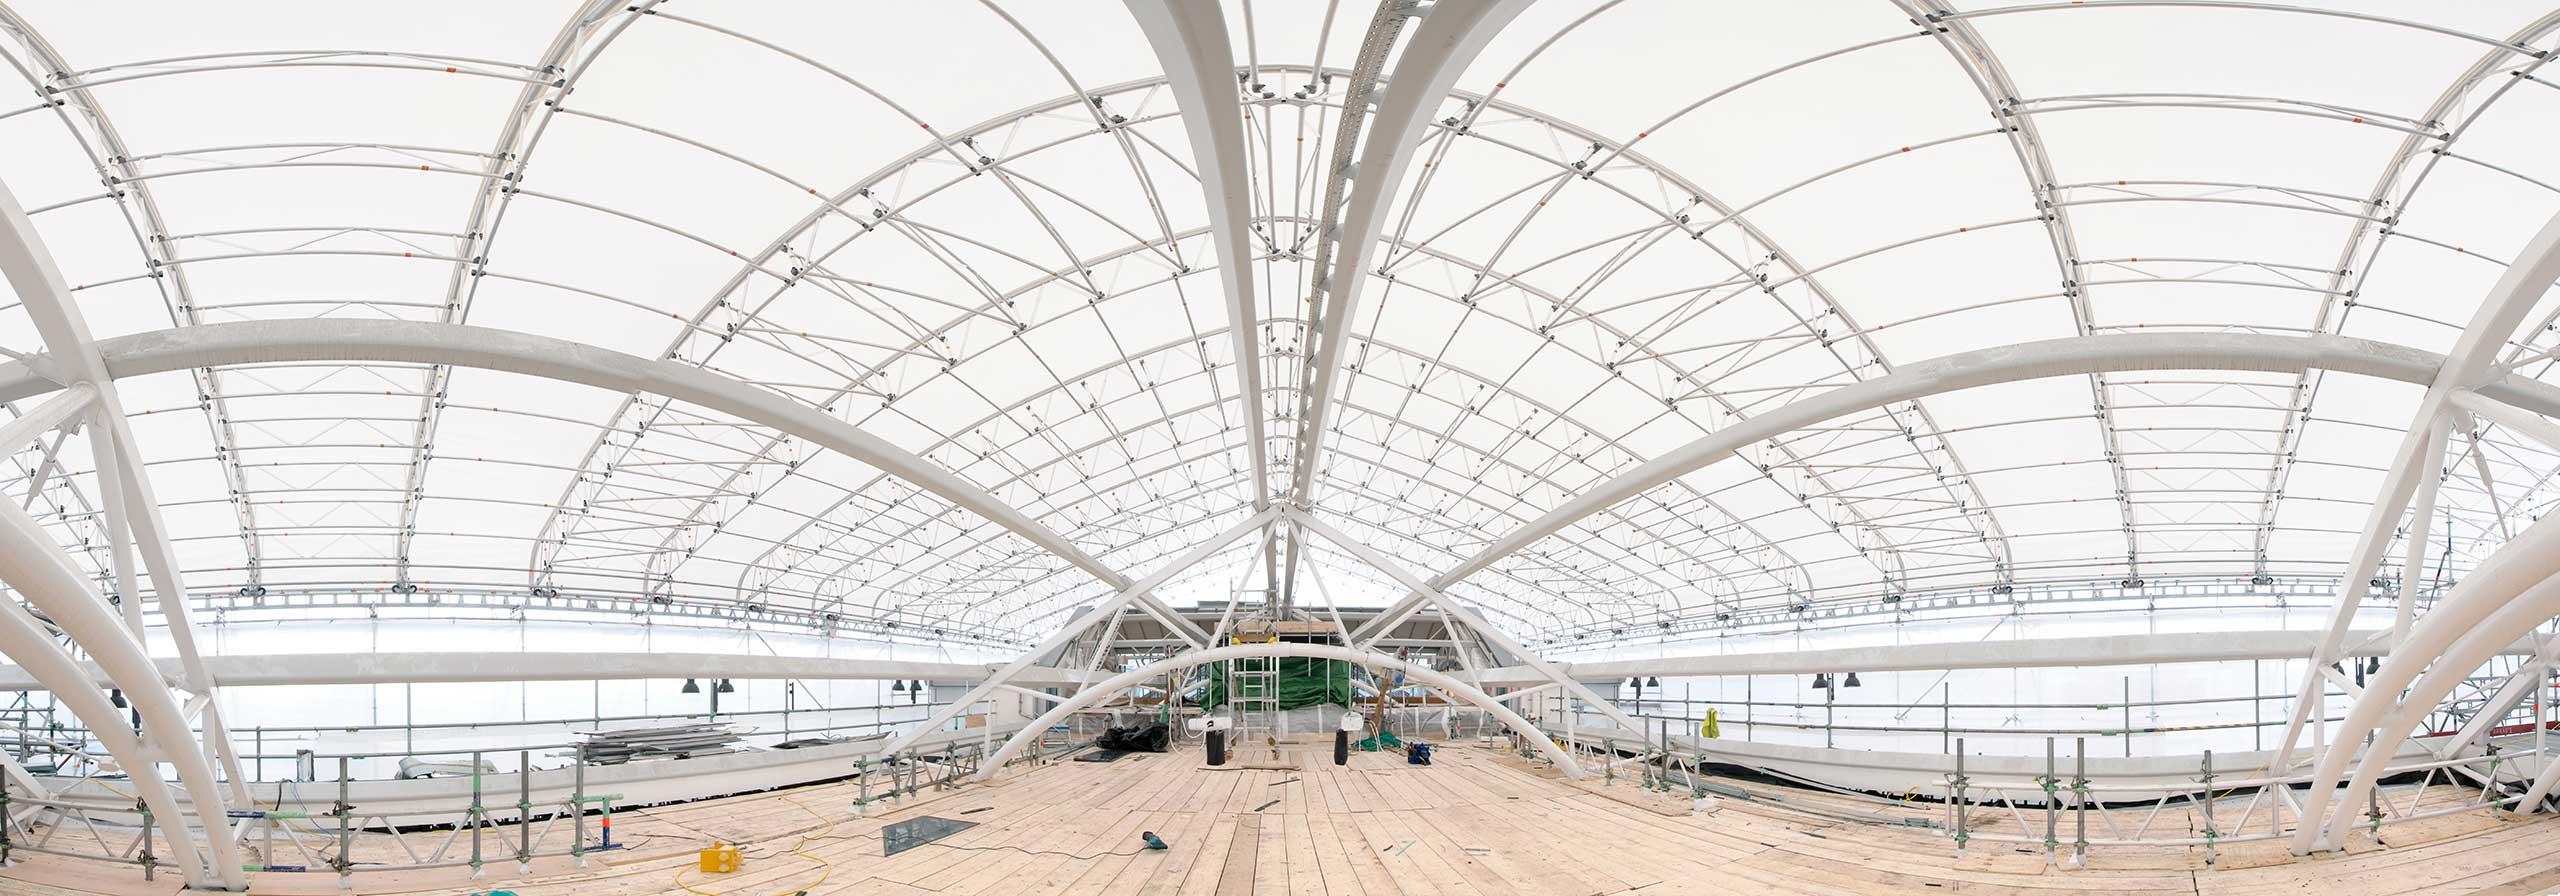 Uk Debut For Keder Xl Roof Brings Key Benefits To